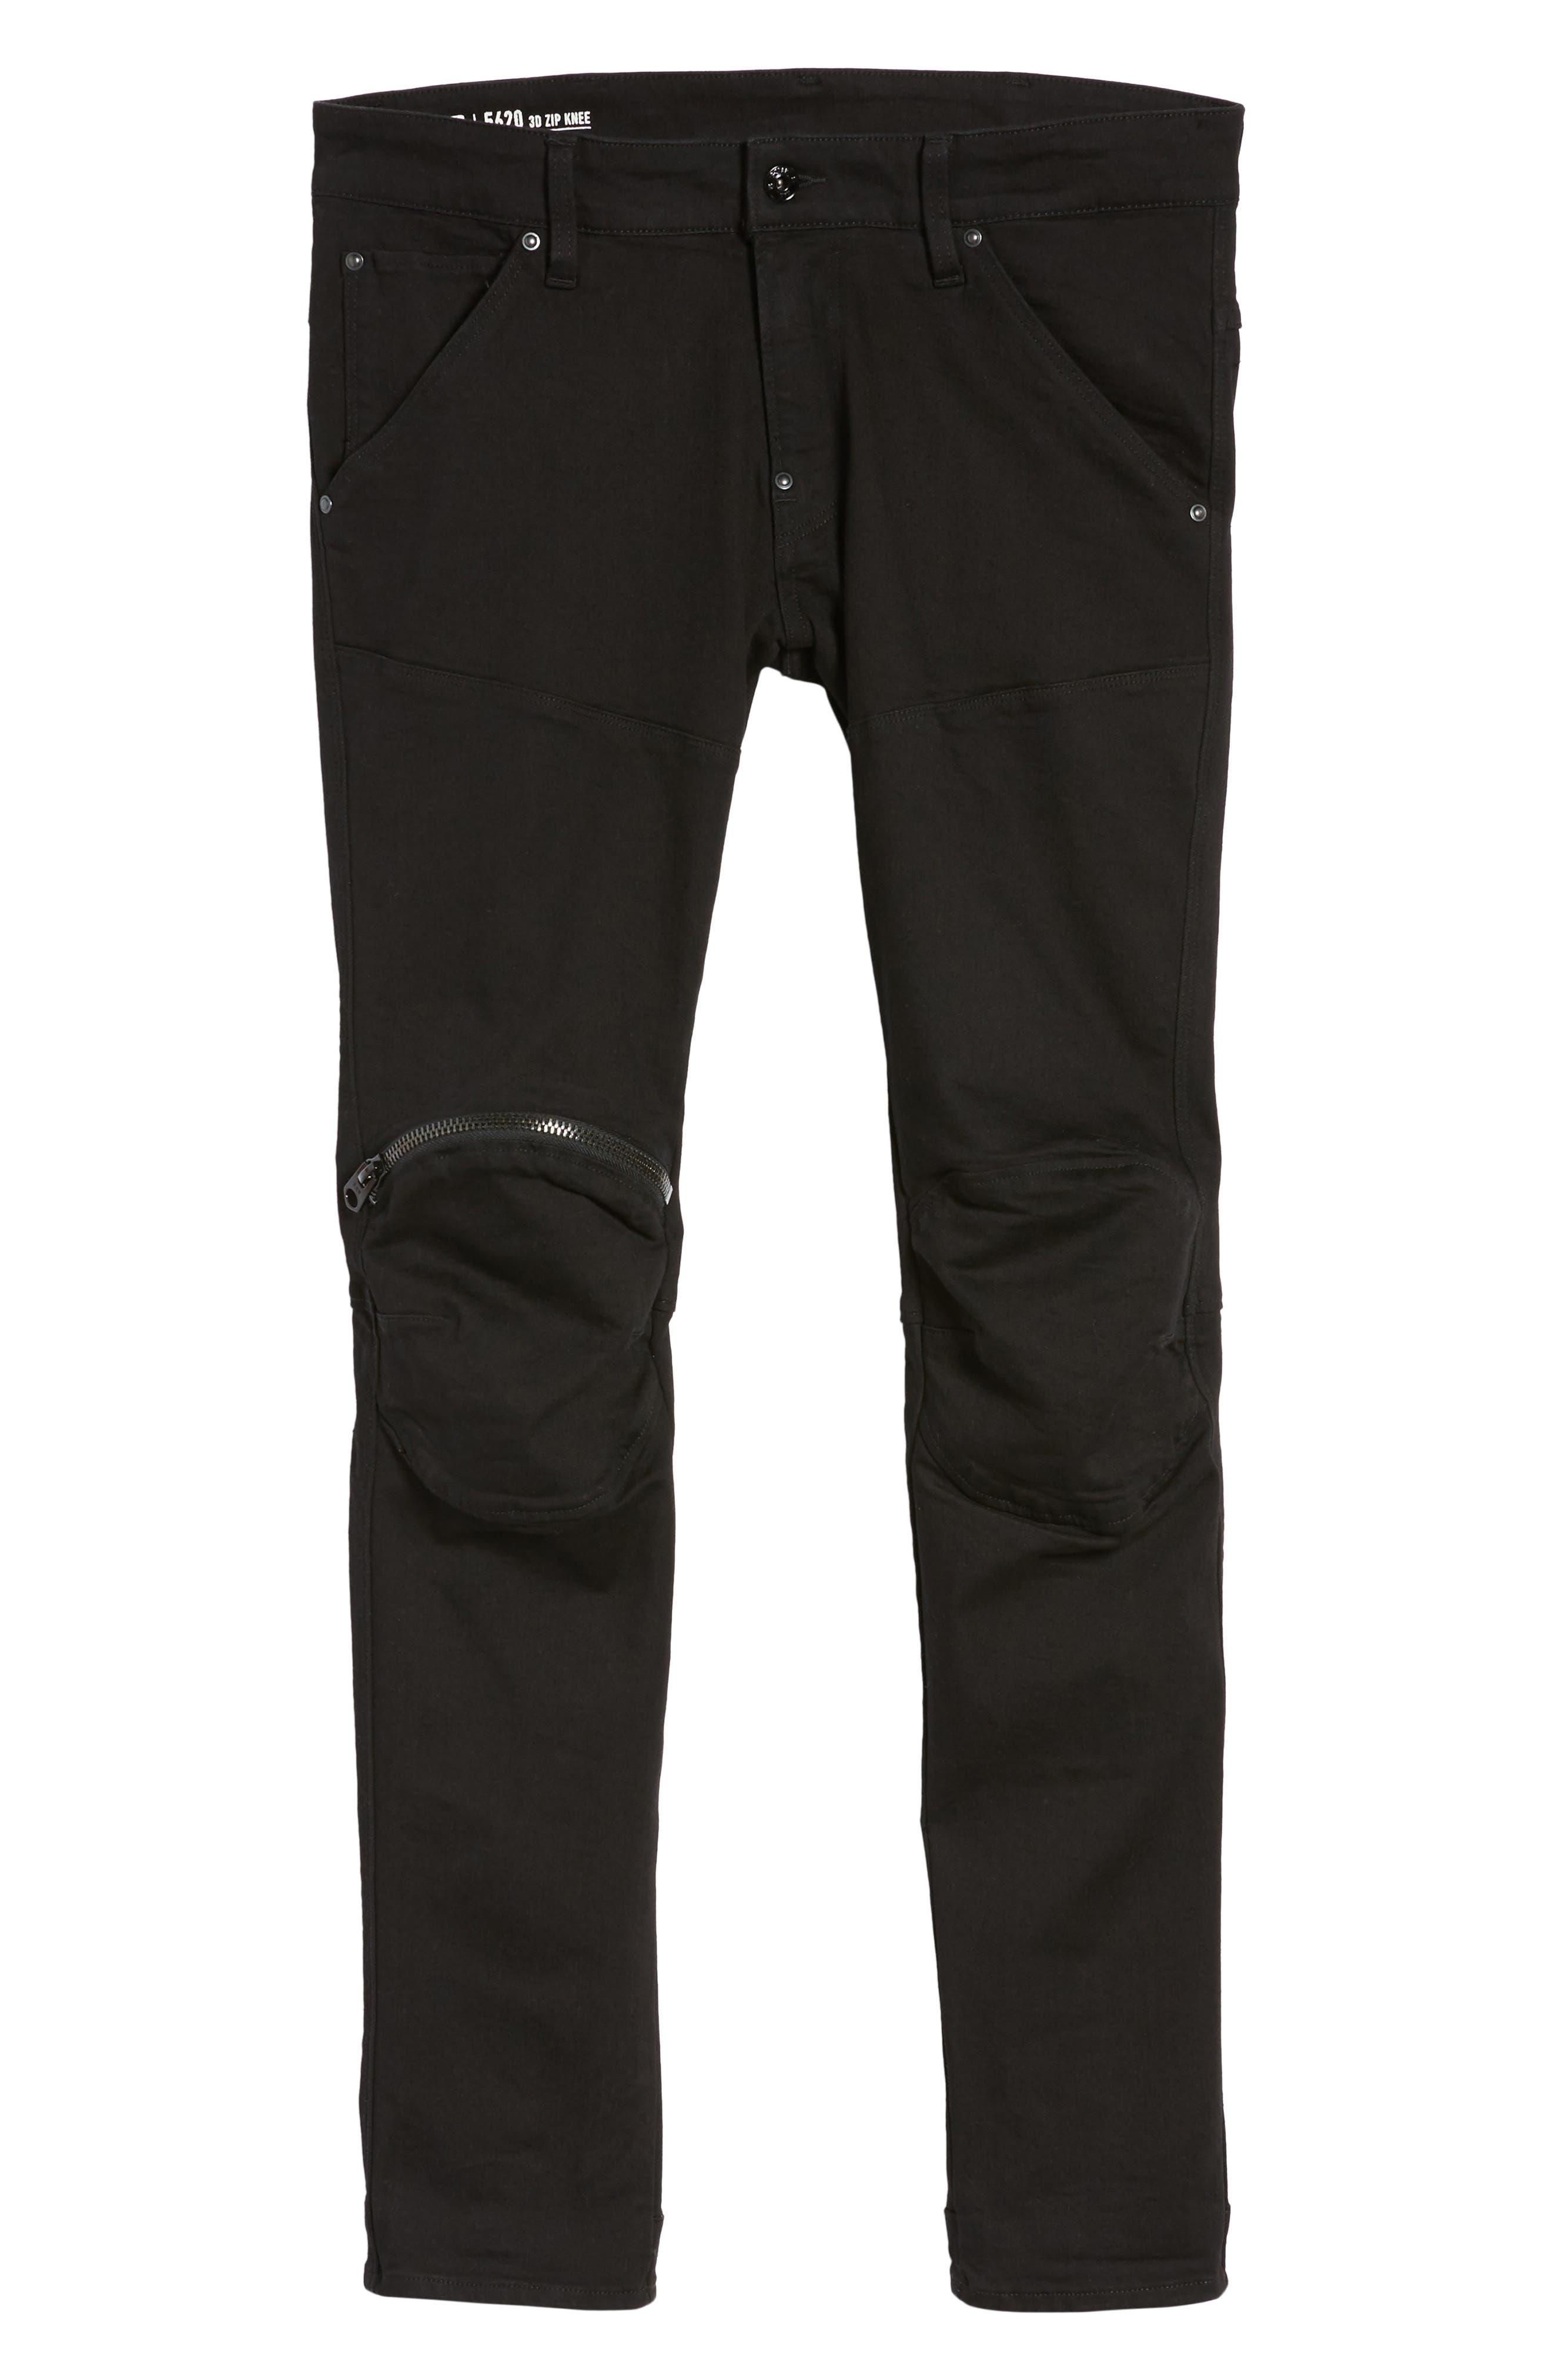 3D Zip Knee Super Slim Pants,                             Alternate thumbnail 6, color,                             Rinsed